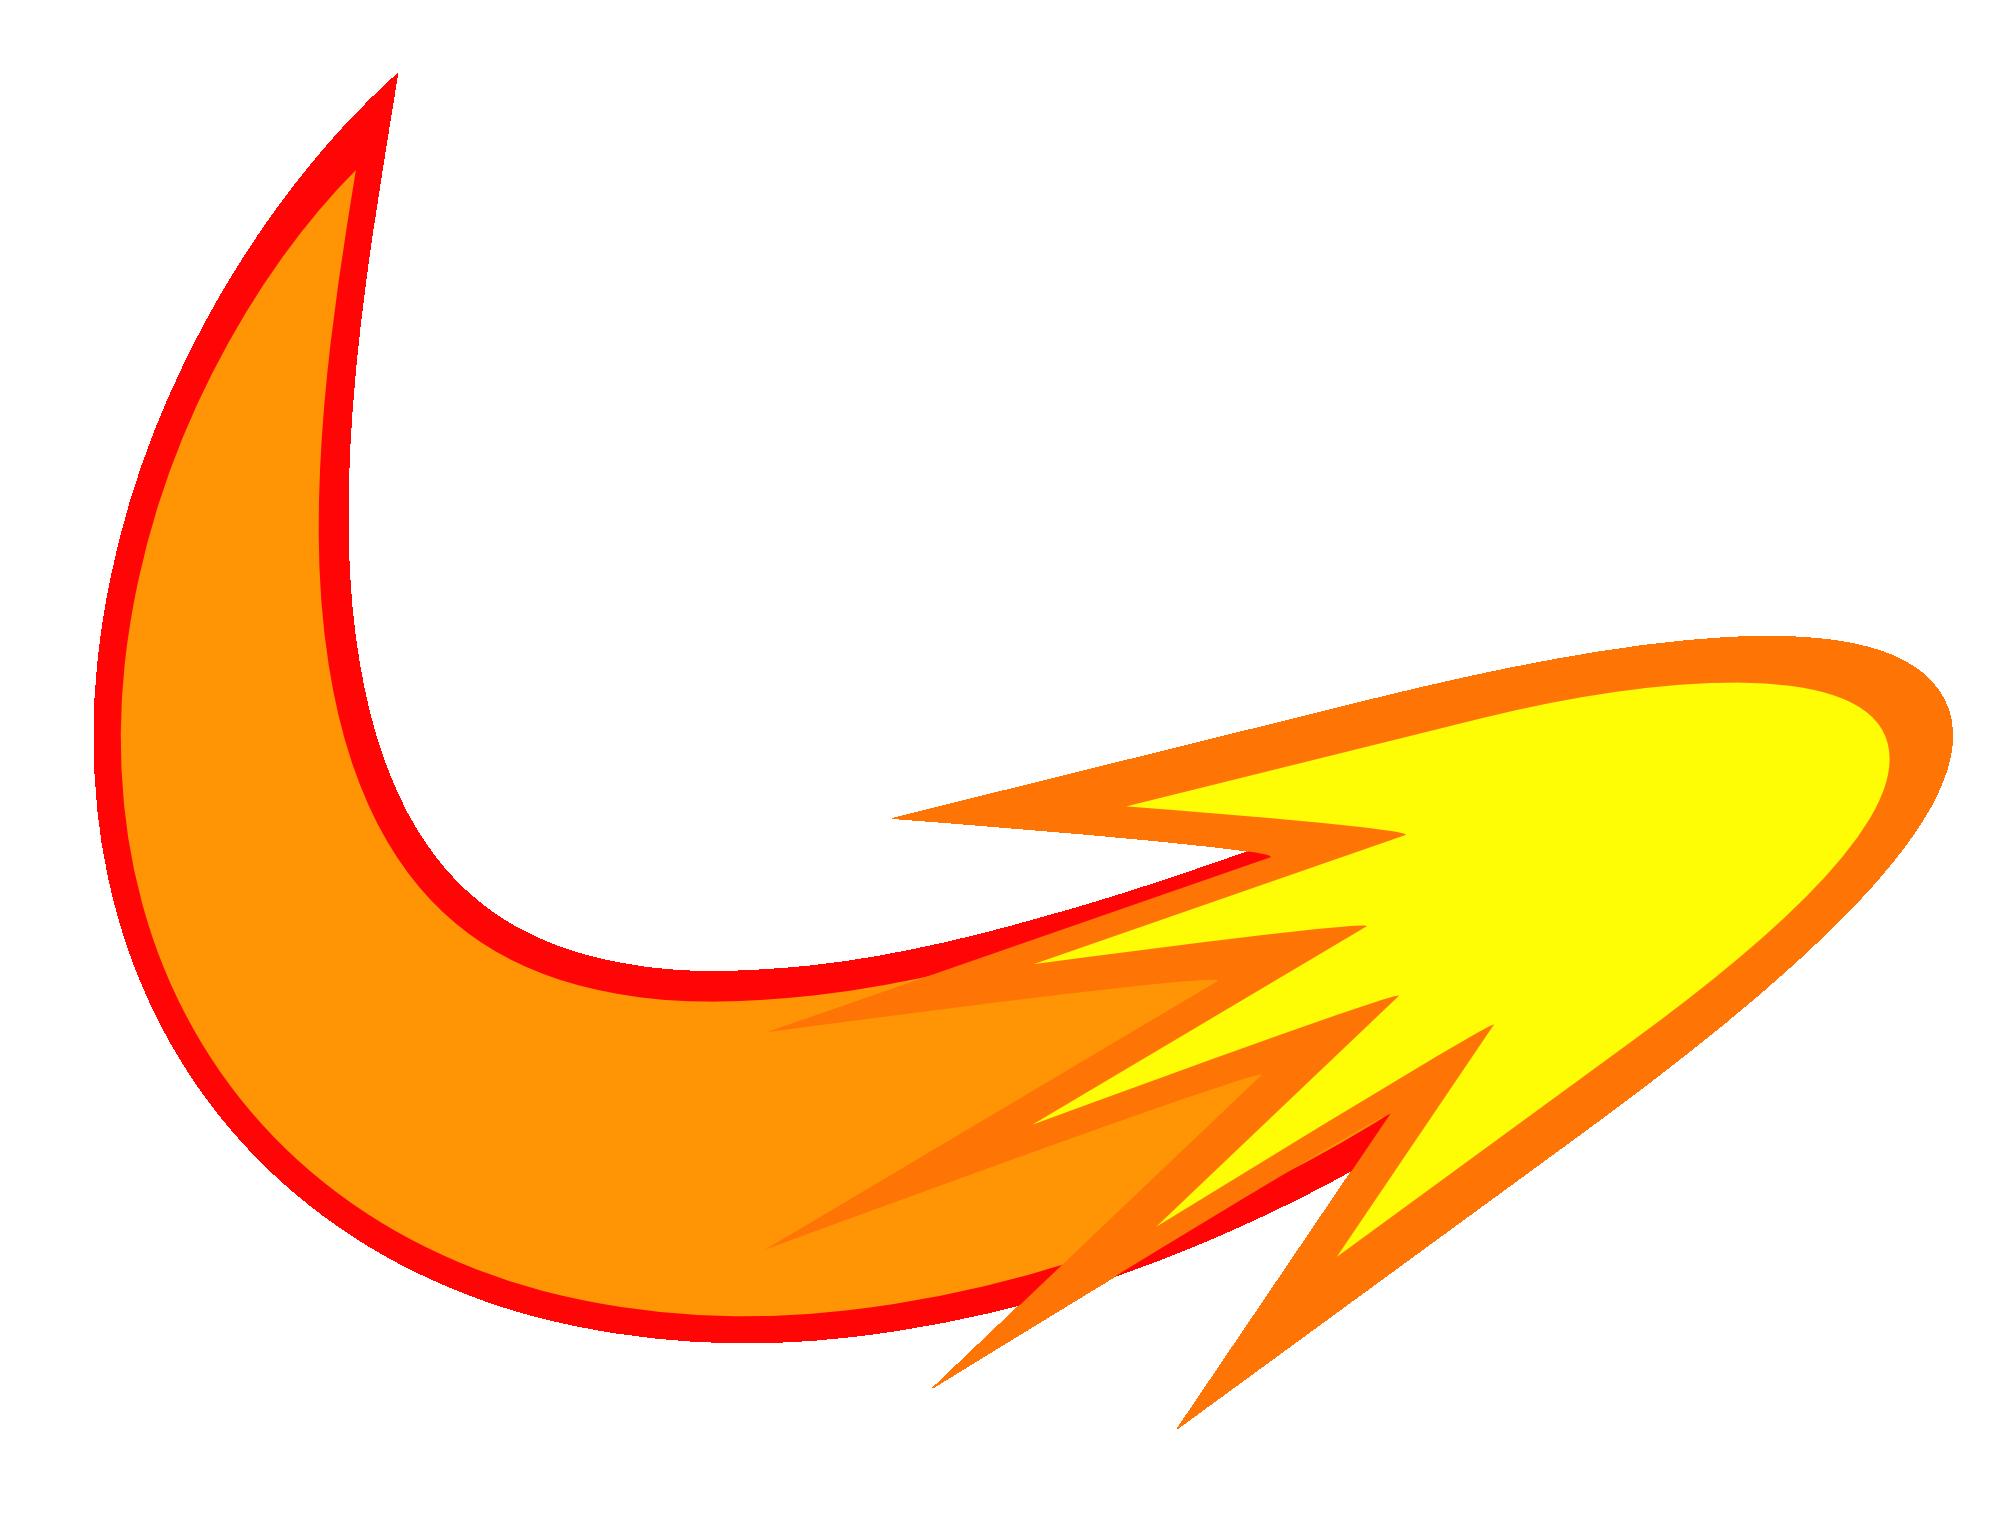 Fire Heart Cutie Mark